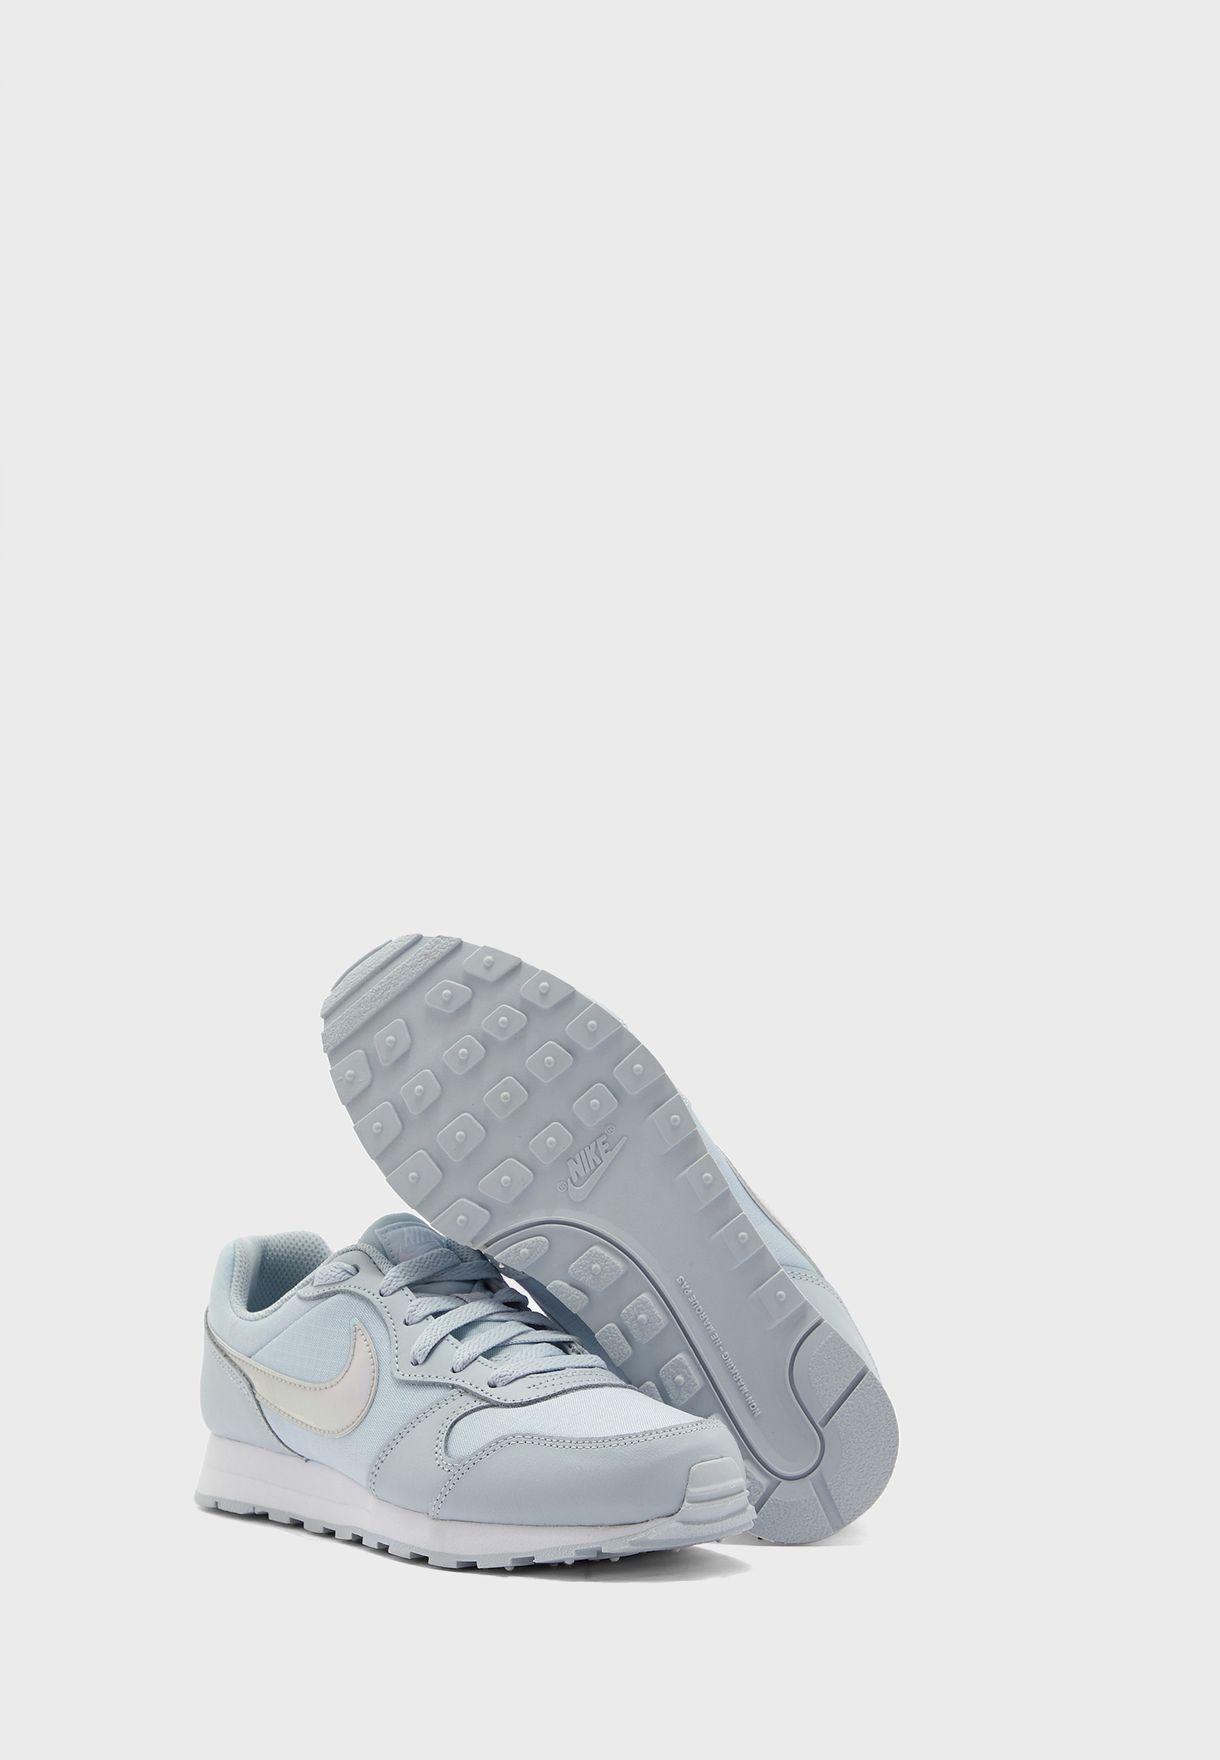 حذاء ام دي رنر 2 اف بي